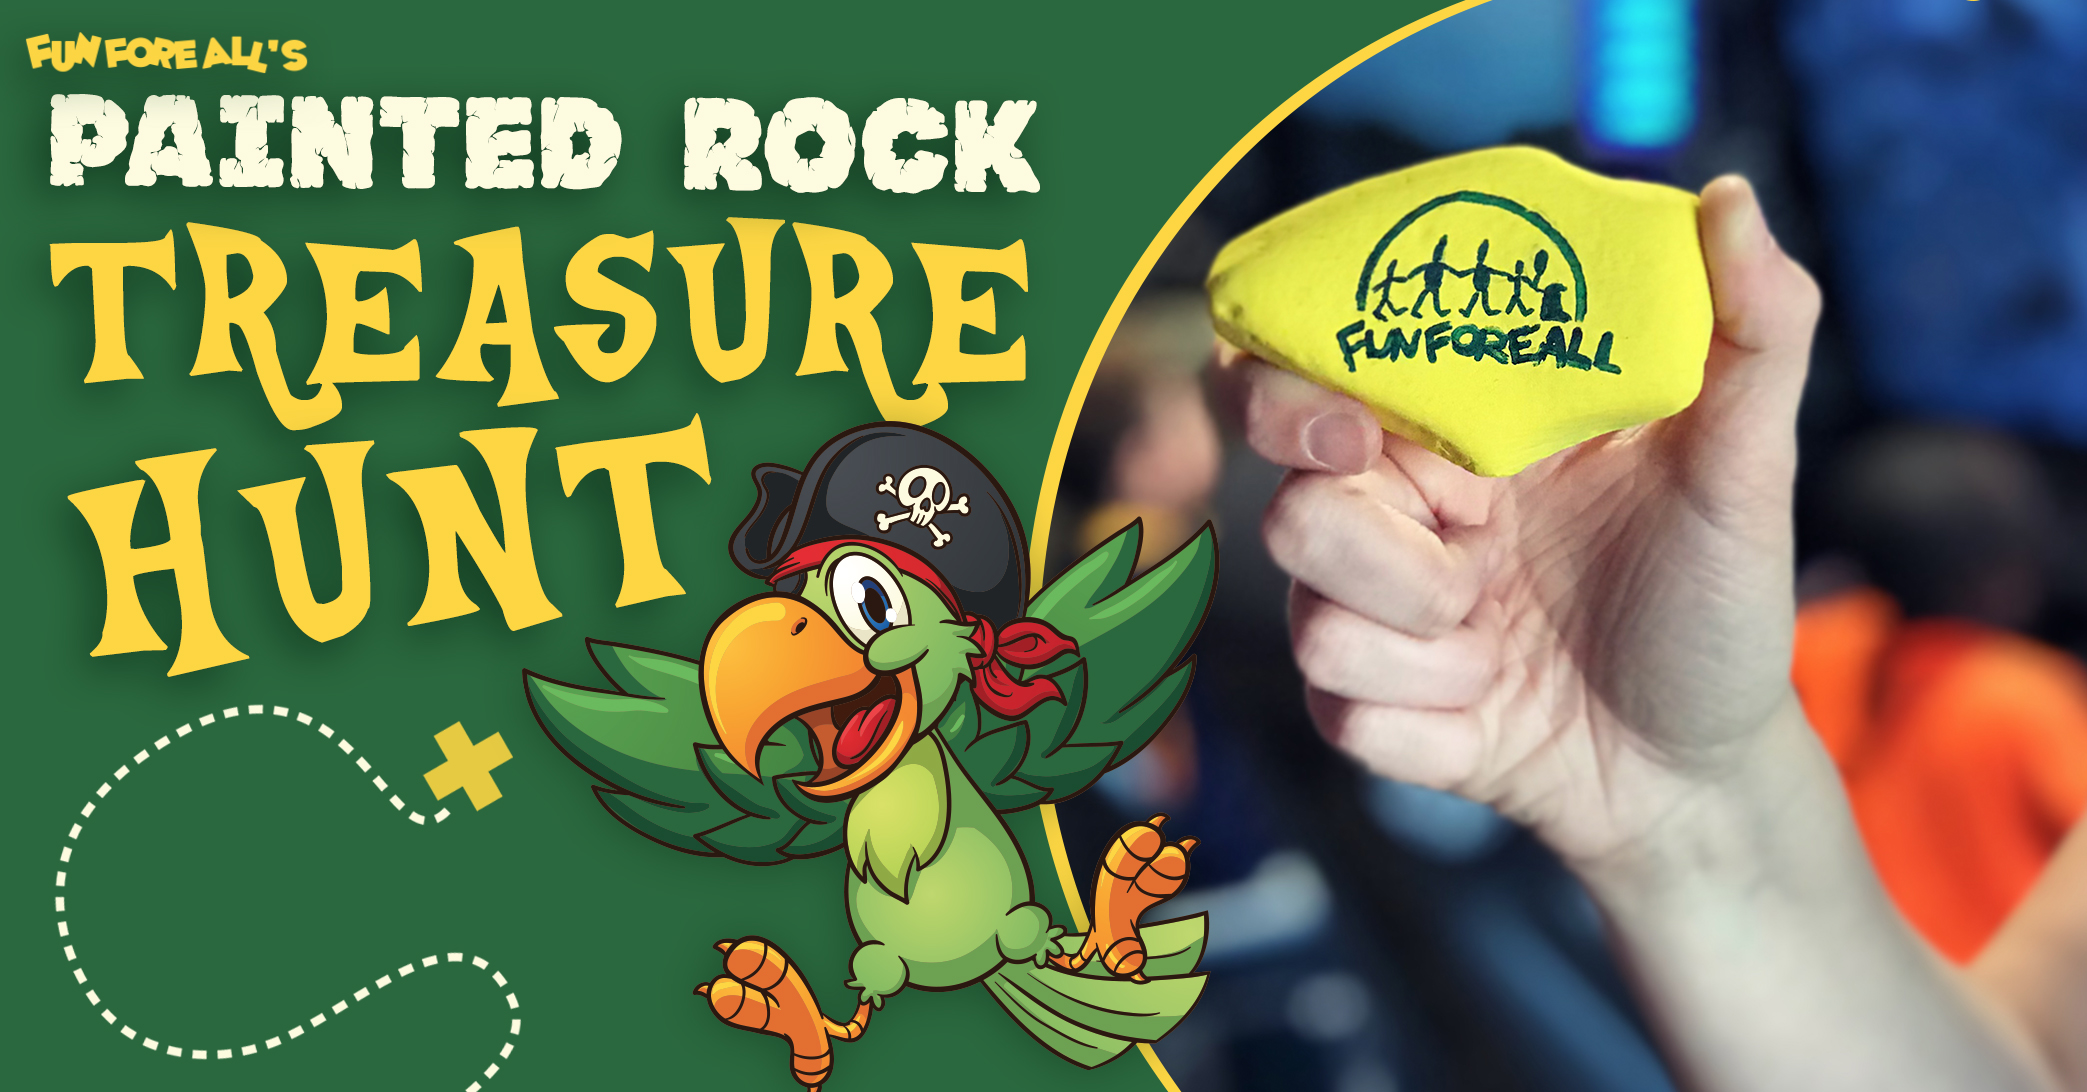 Facebook Invite (FUNtastic Painted Rock Treasure Hunt) 1.jpg